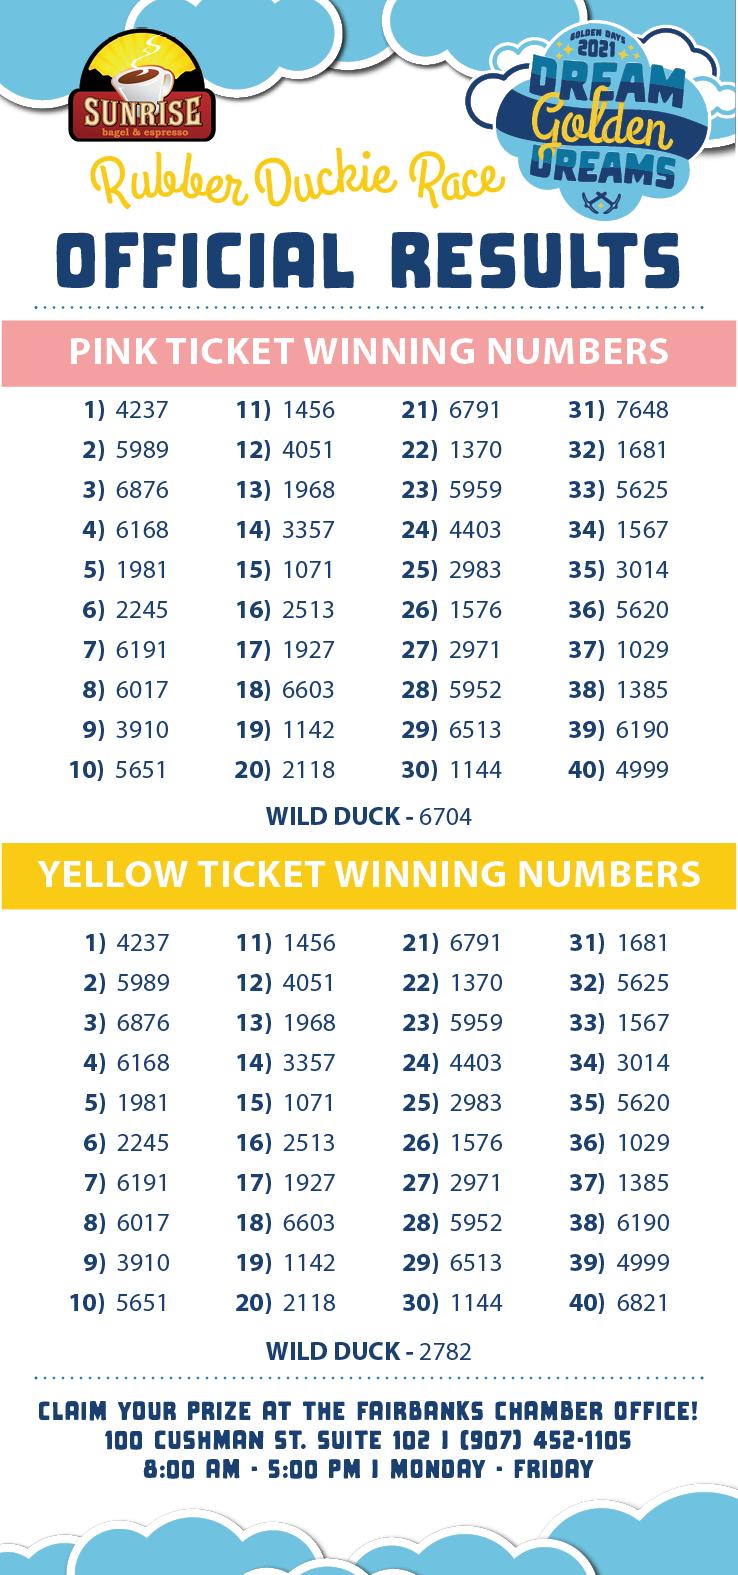 Winning-Numbers-Web-v2.jpg